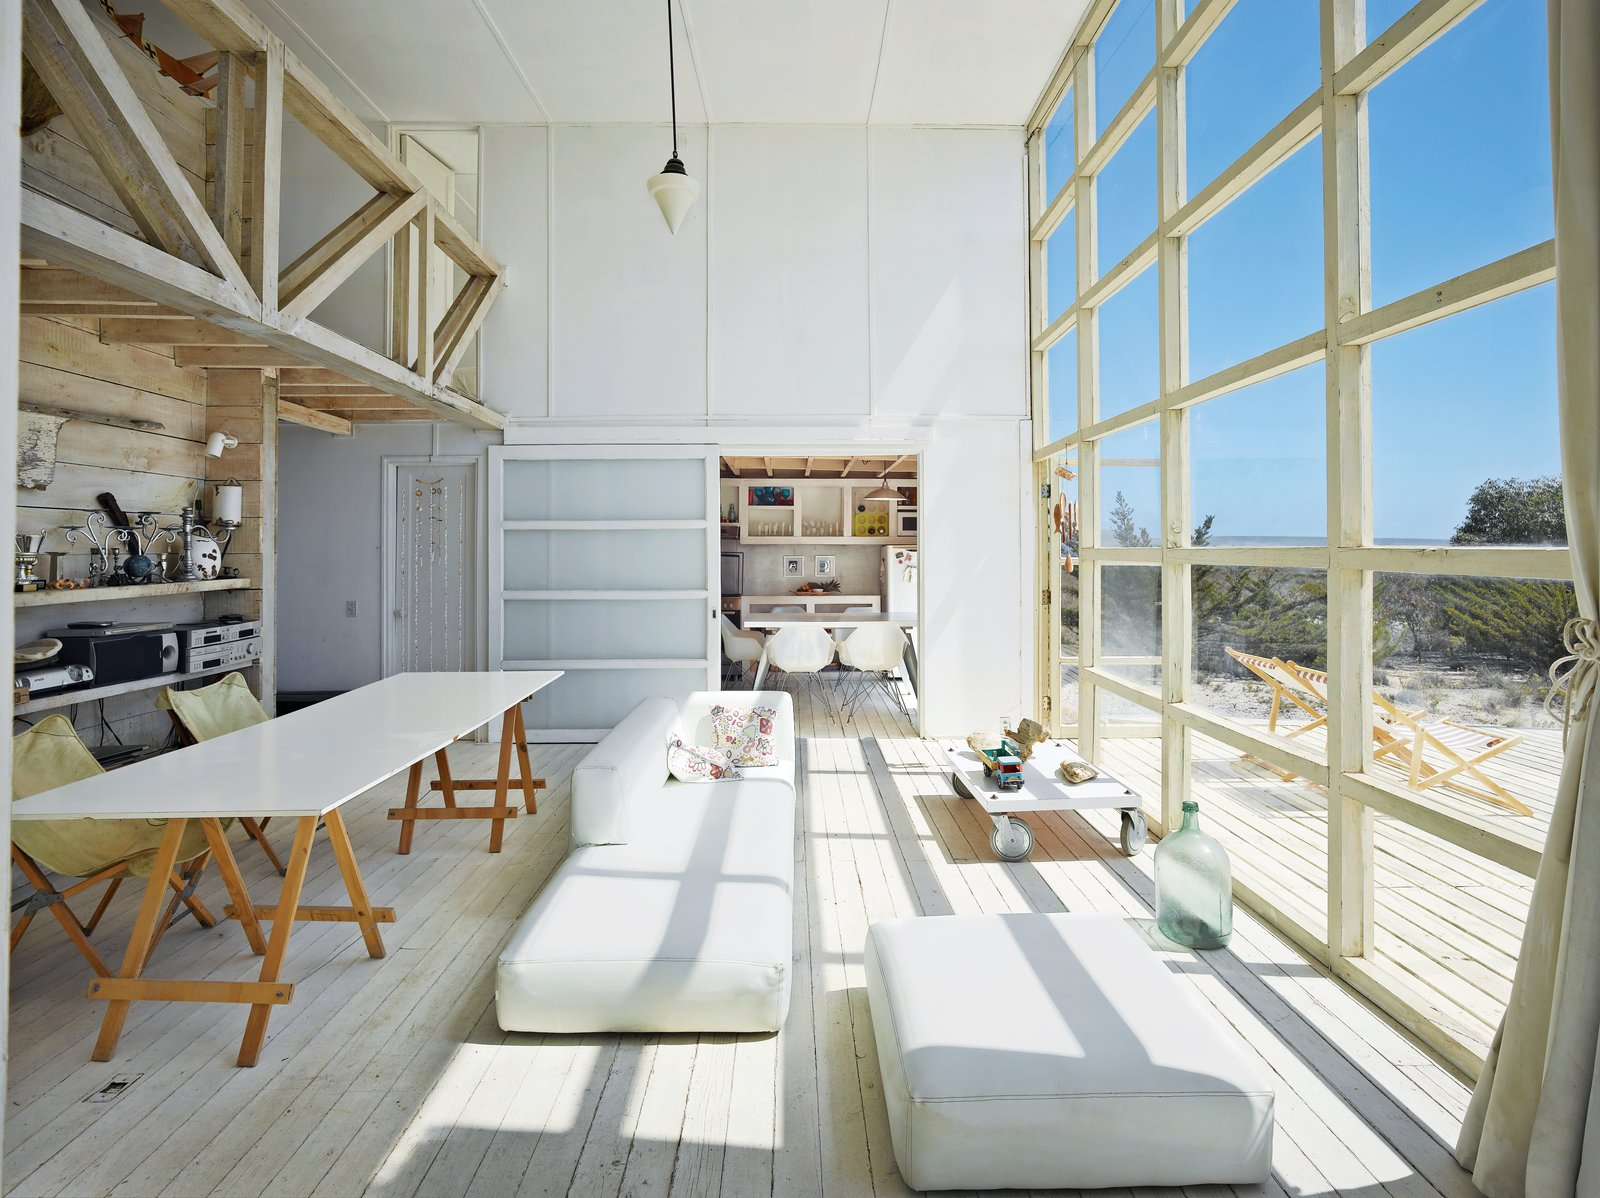 #beachhouse #bayfront #Chile #remote #summer #getaway #wood #windows #MathiasKlotz